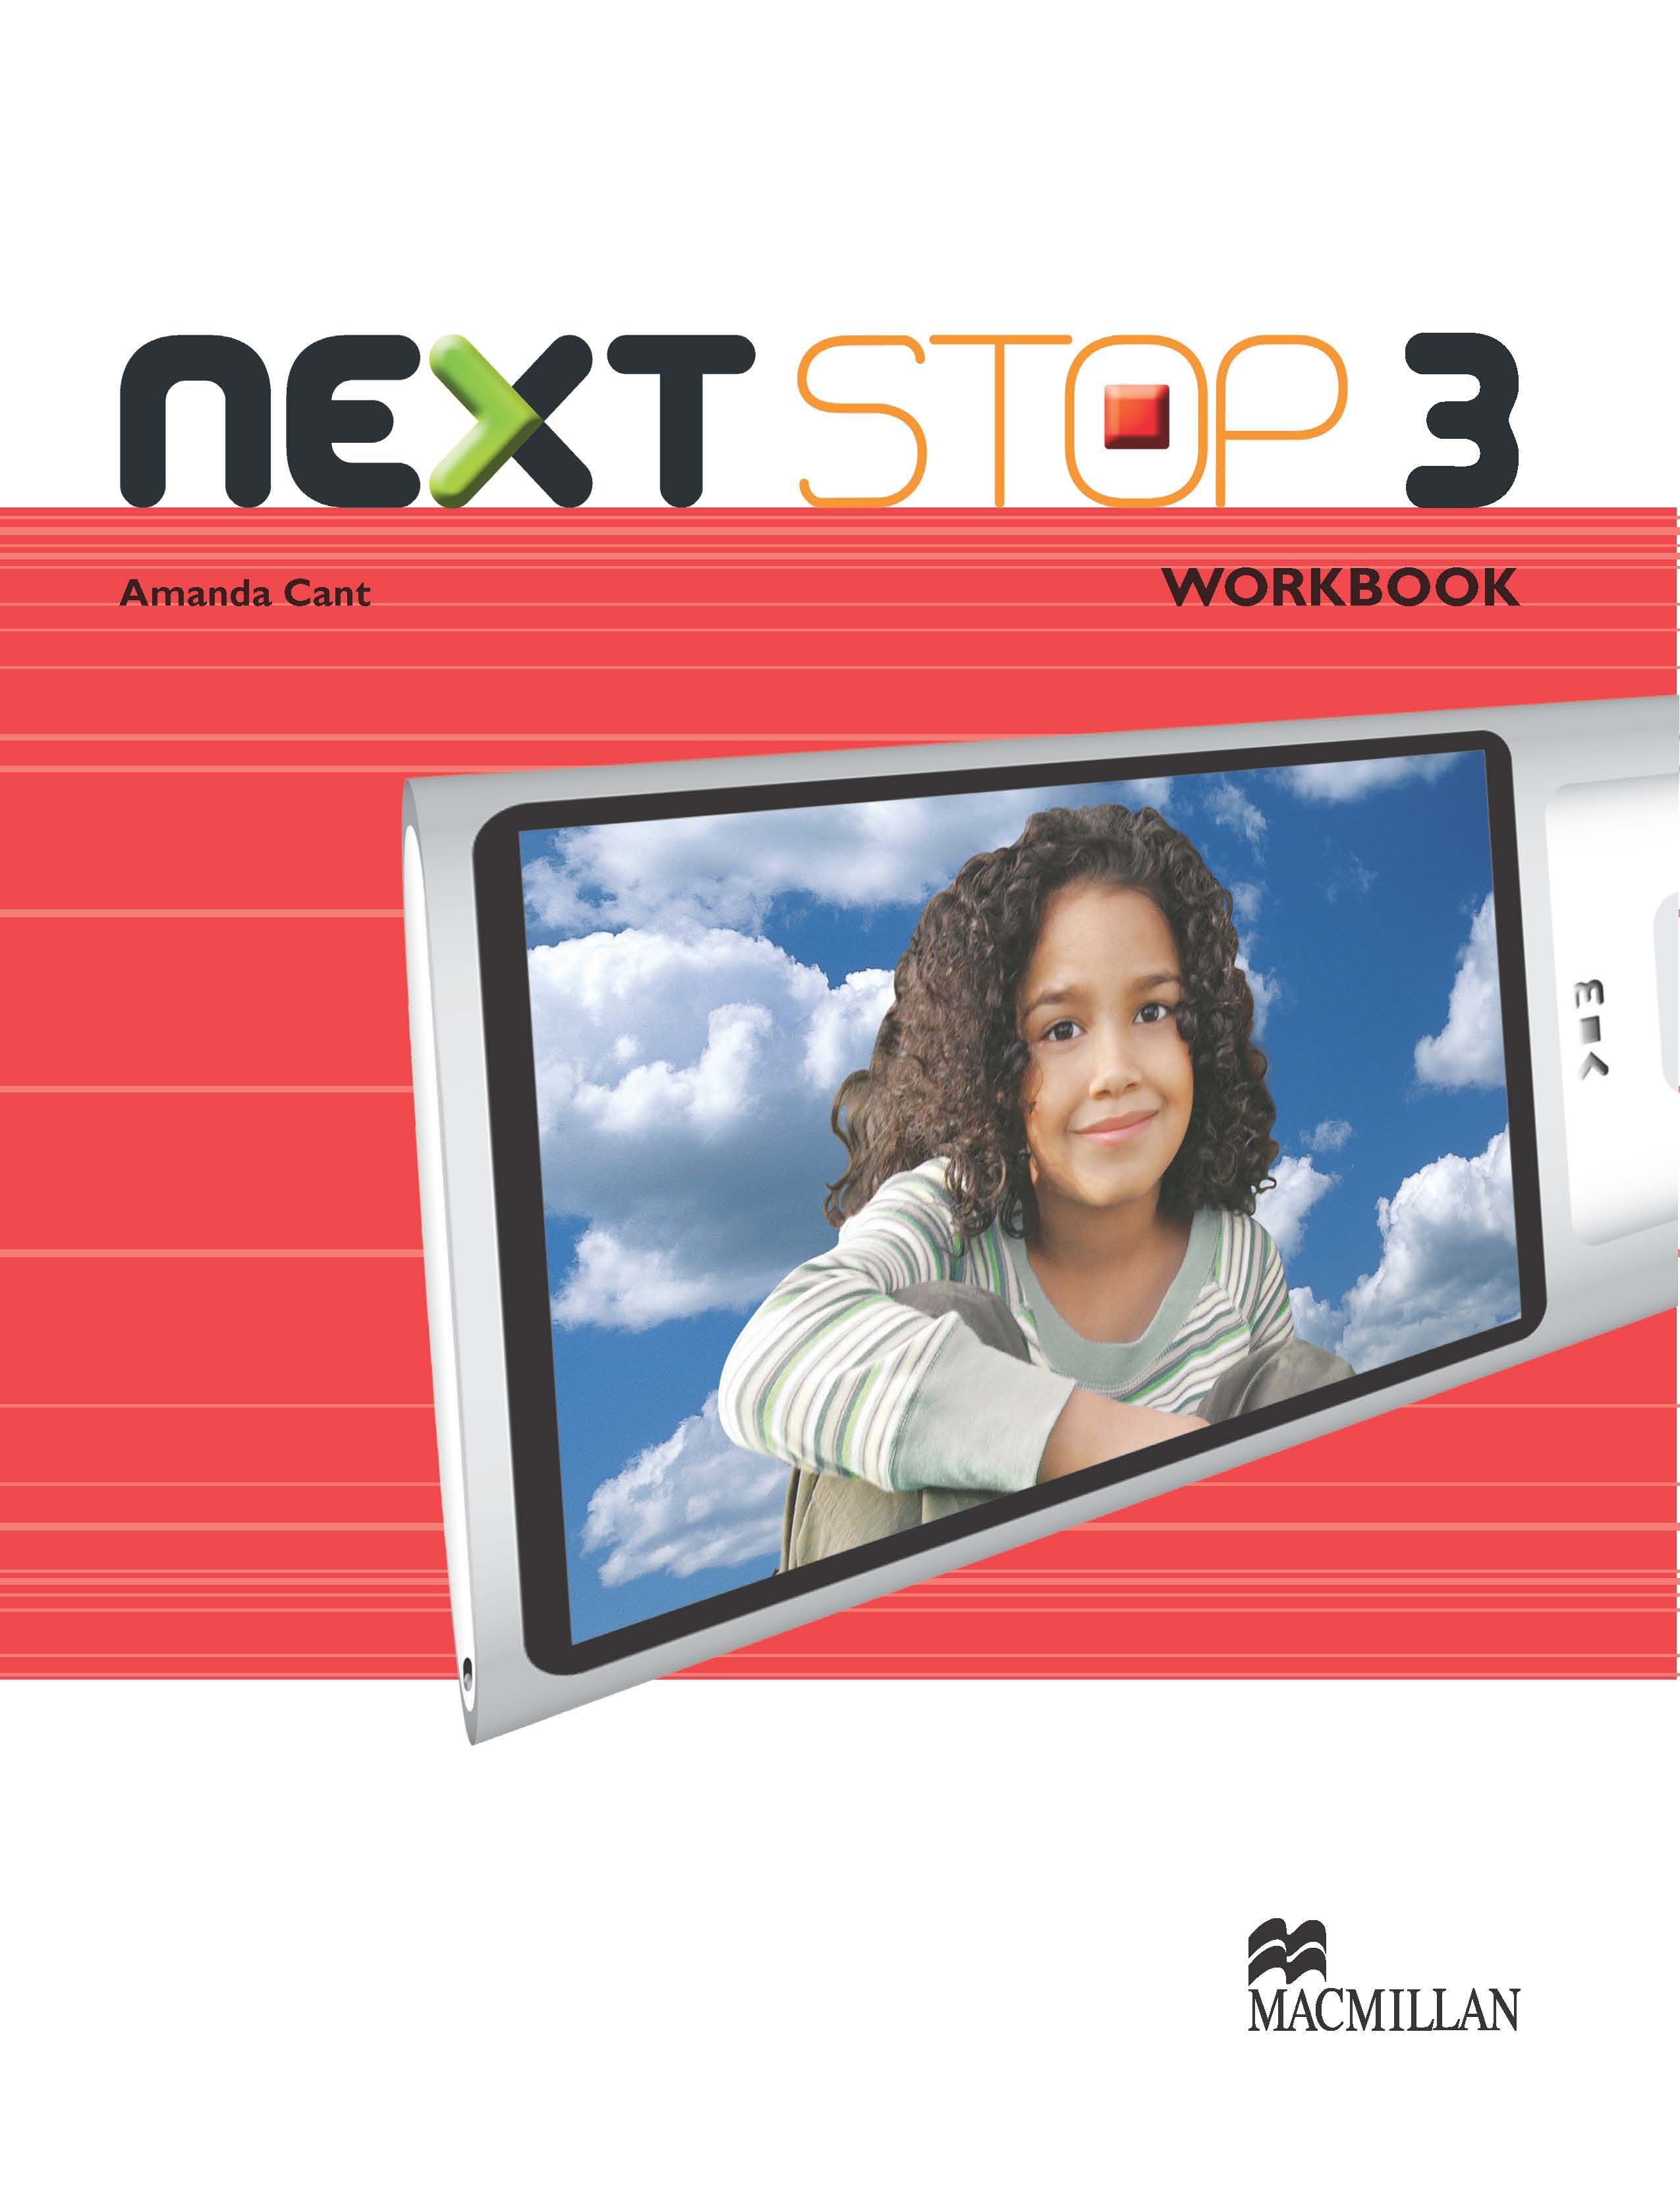 Next Stop 3 Workbook